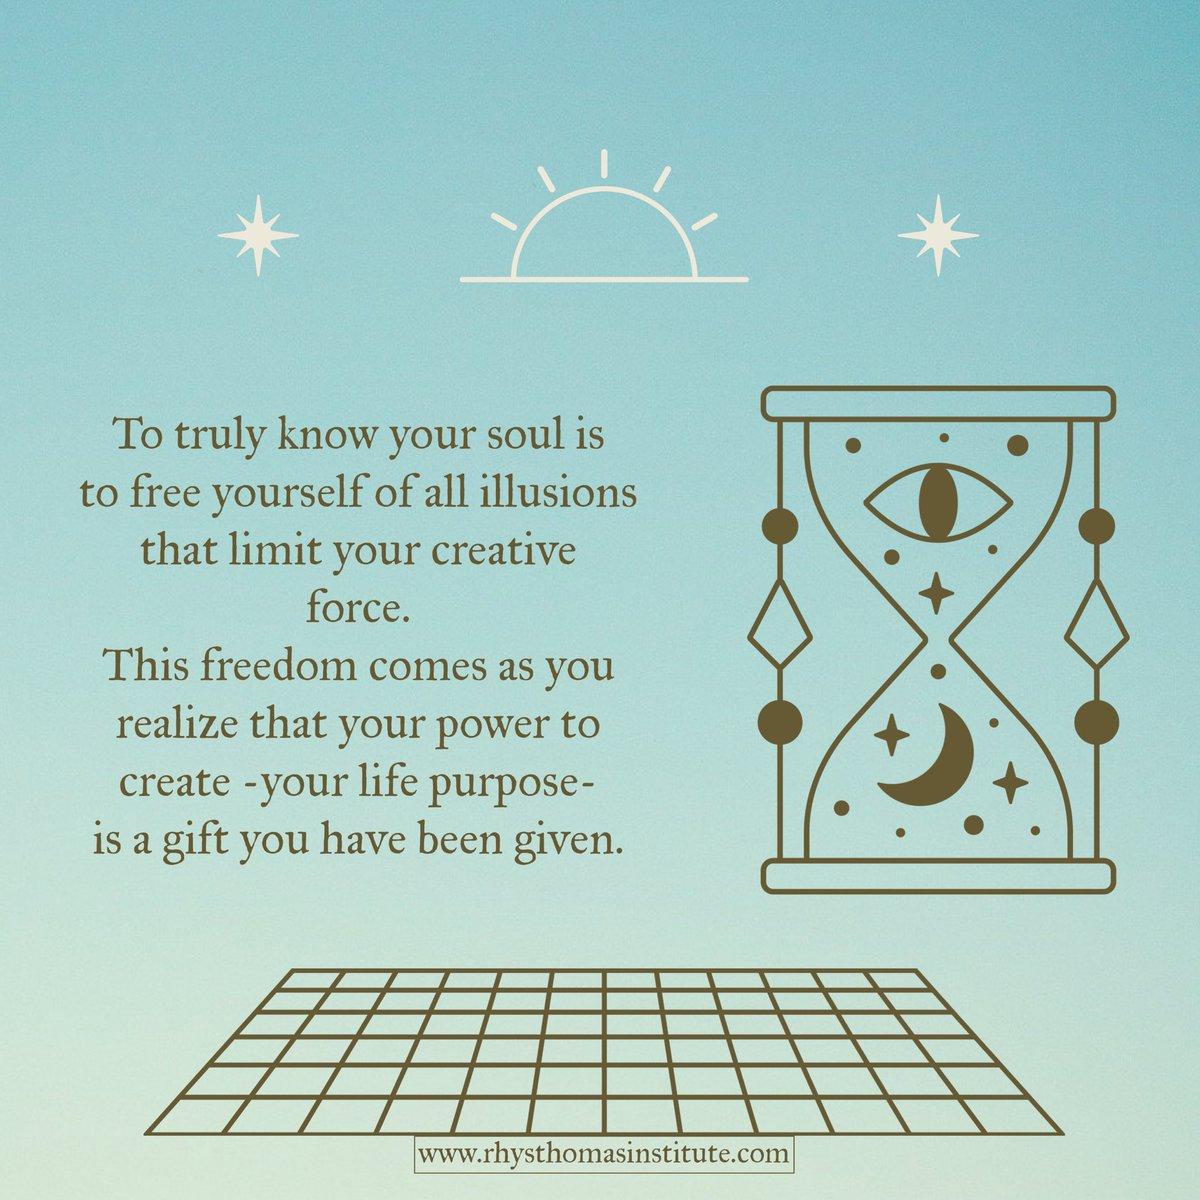 #soul #free #motivationmonday #chakras #Purpose #spiritualawakening #transformation  #energyhealing #GoodMonday #BlueMonday